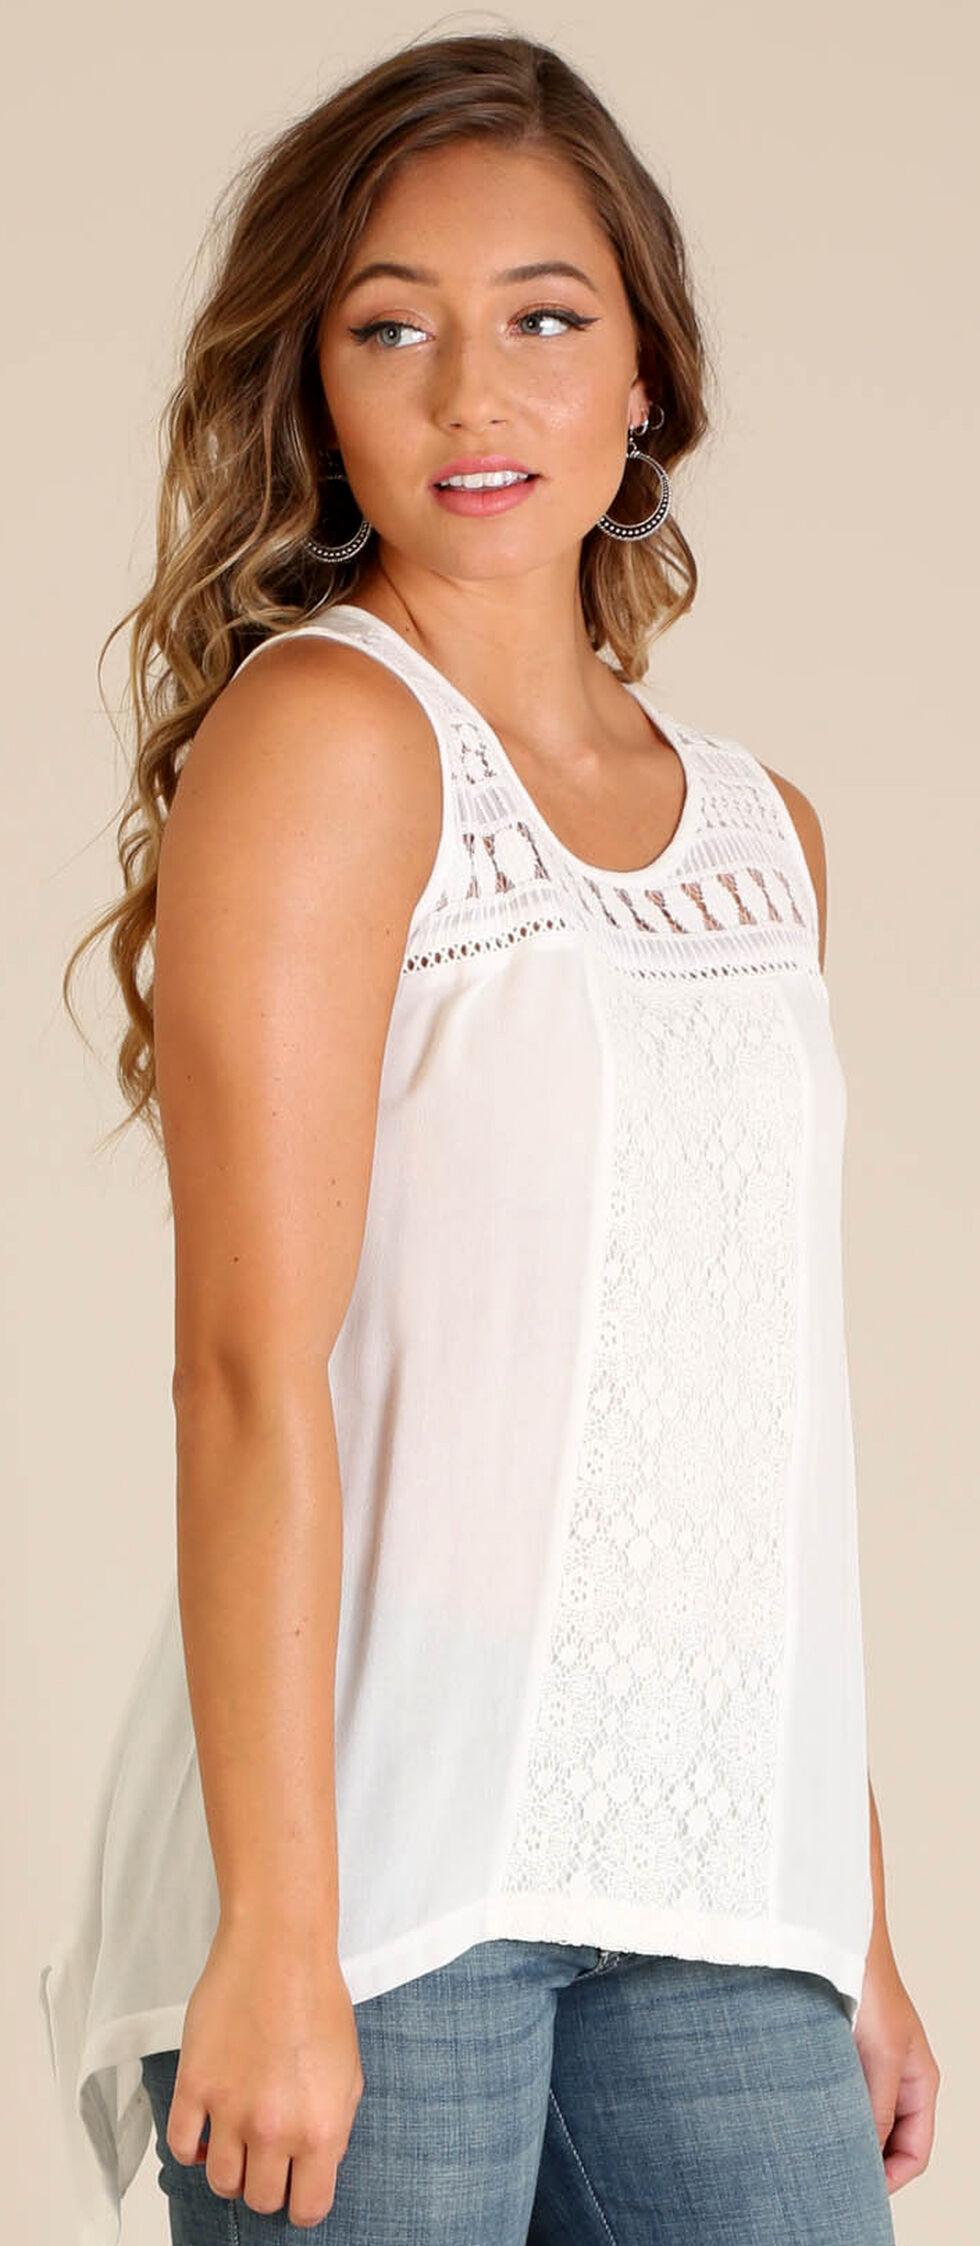 Wrangler Women's Sleeveless Top with Crochet Front, Cream, hi-res